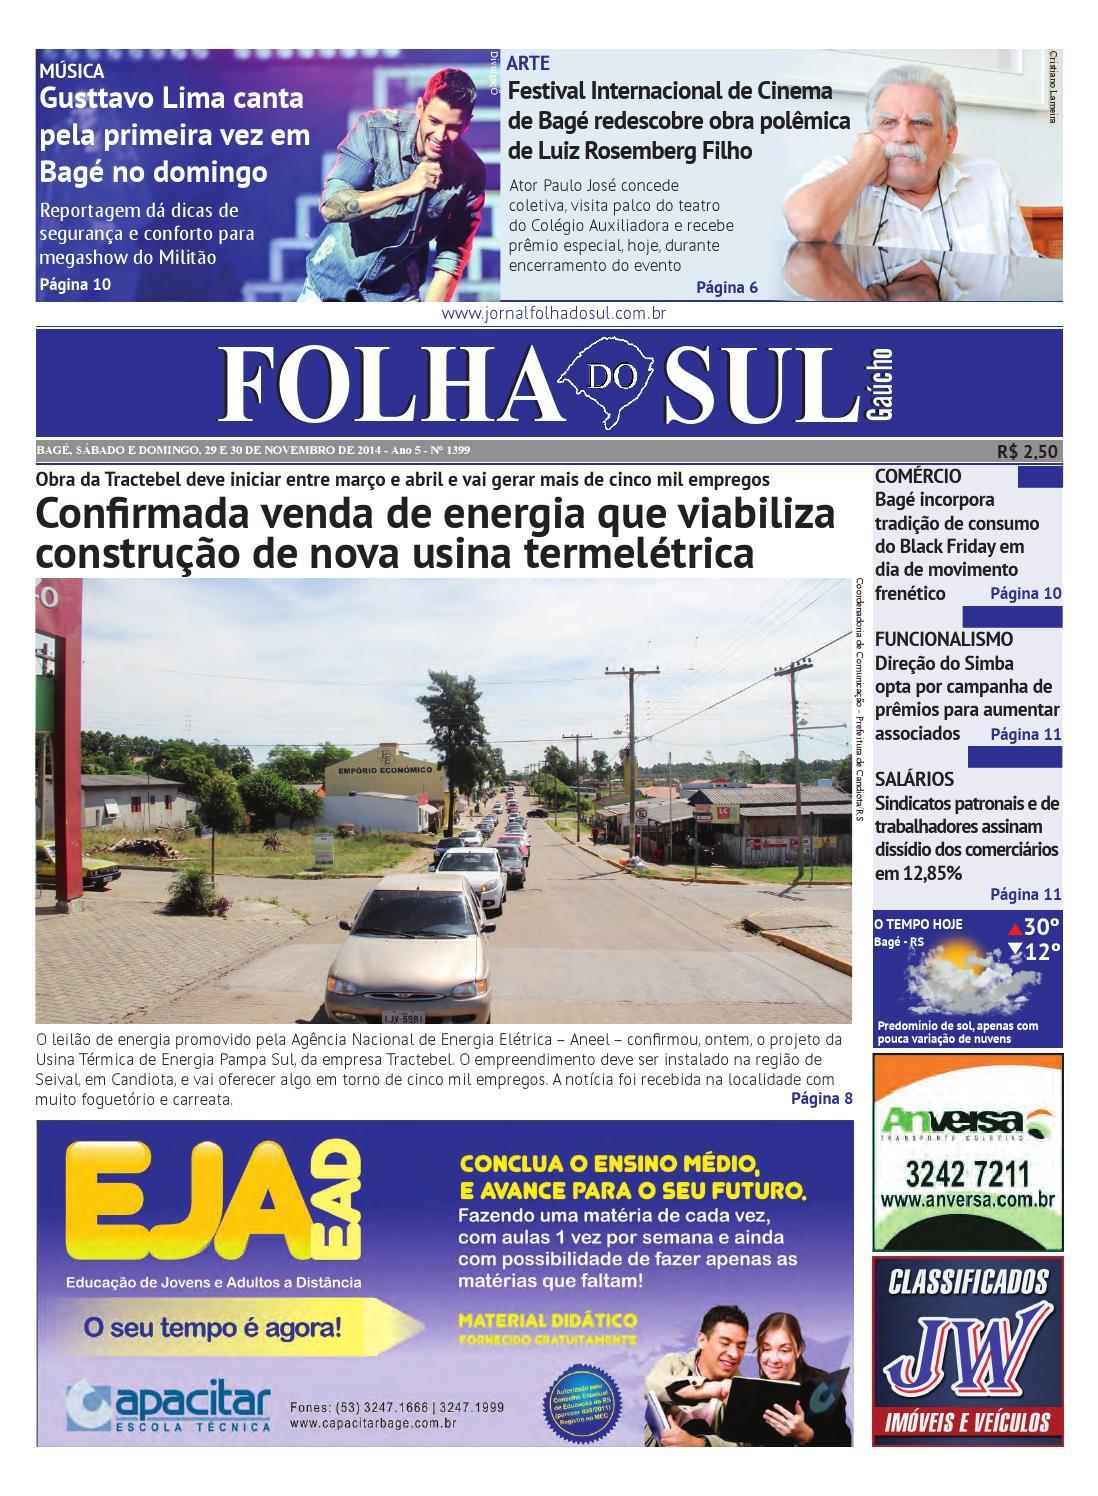 5b5961703e Folha do Sul Gaúcho Ed. 1399 (29 11 2014) by Folha do Sul Gaúcho - issuu